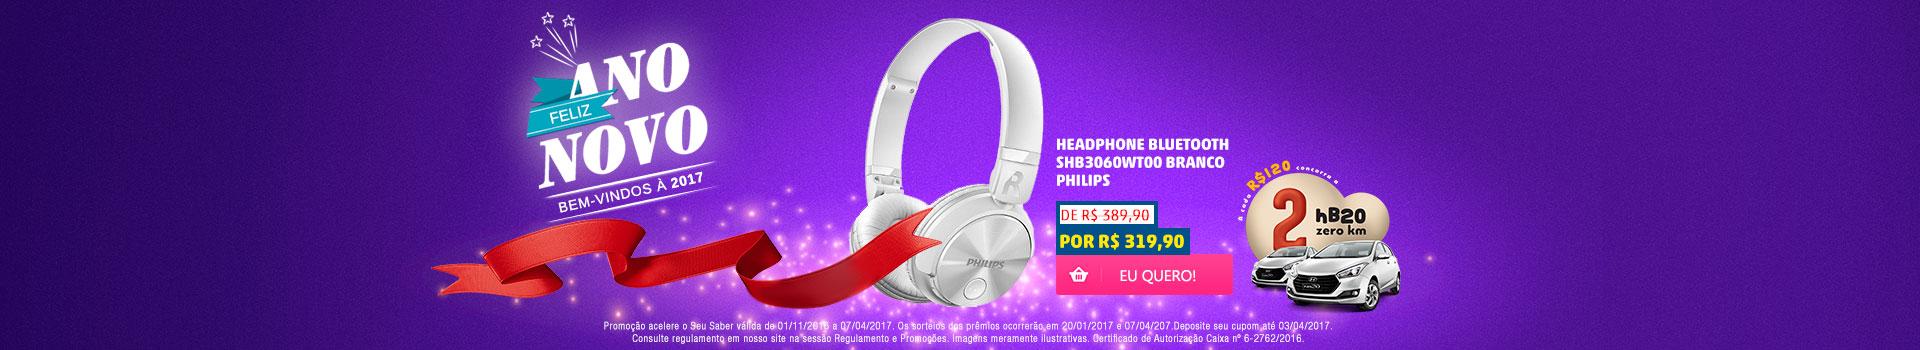 Headphone Bluettoth